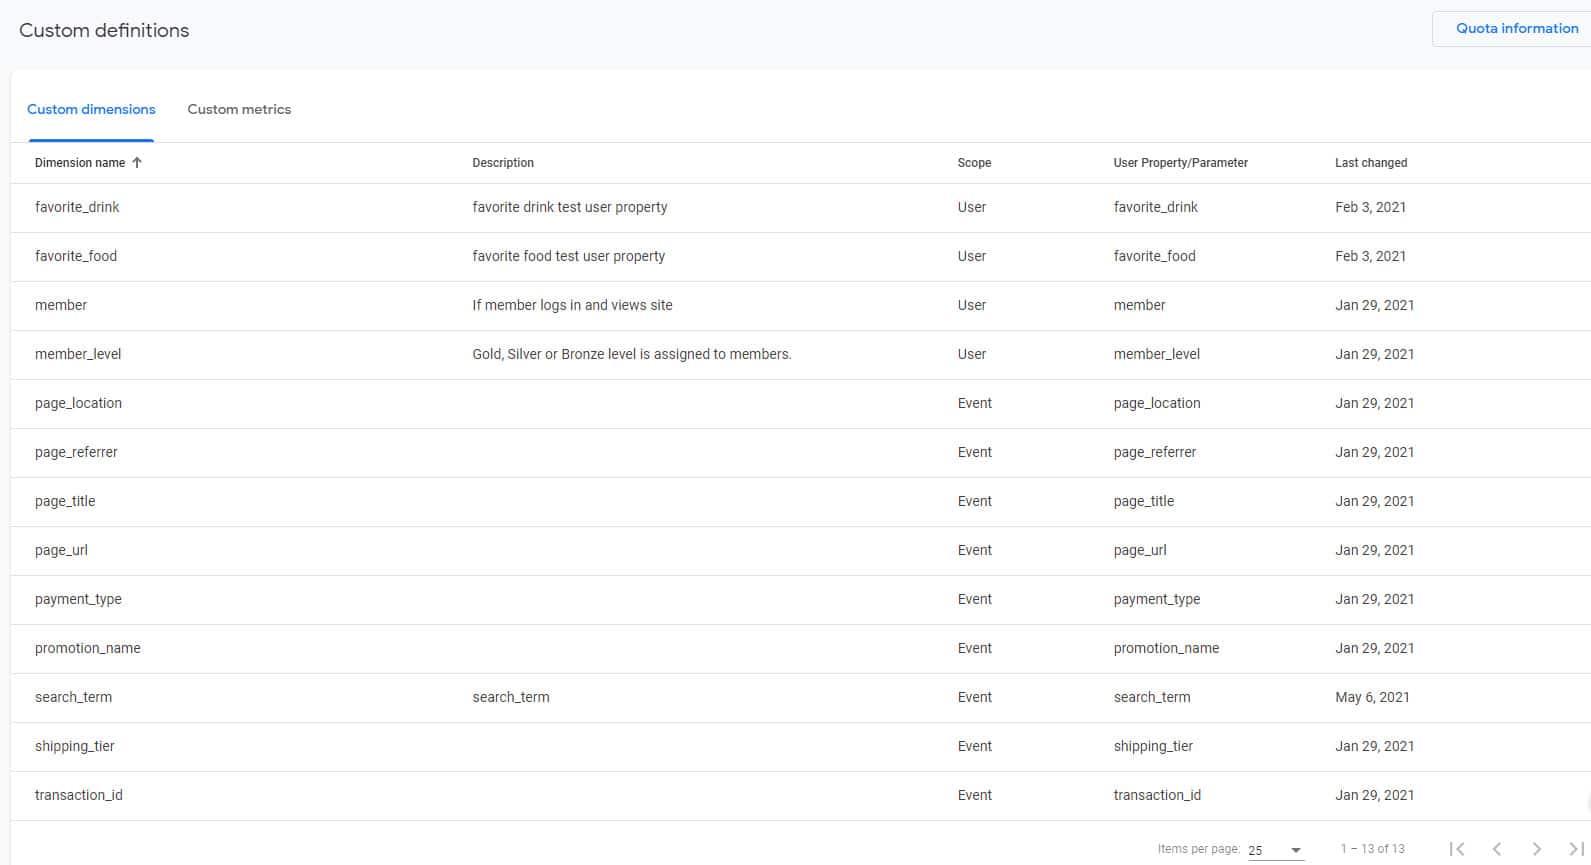 Custom Definitions in Google Analytics 4